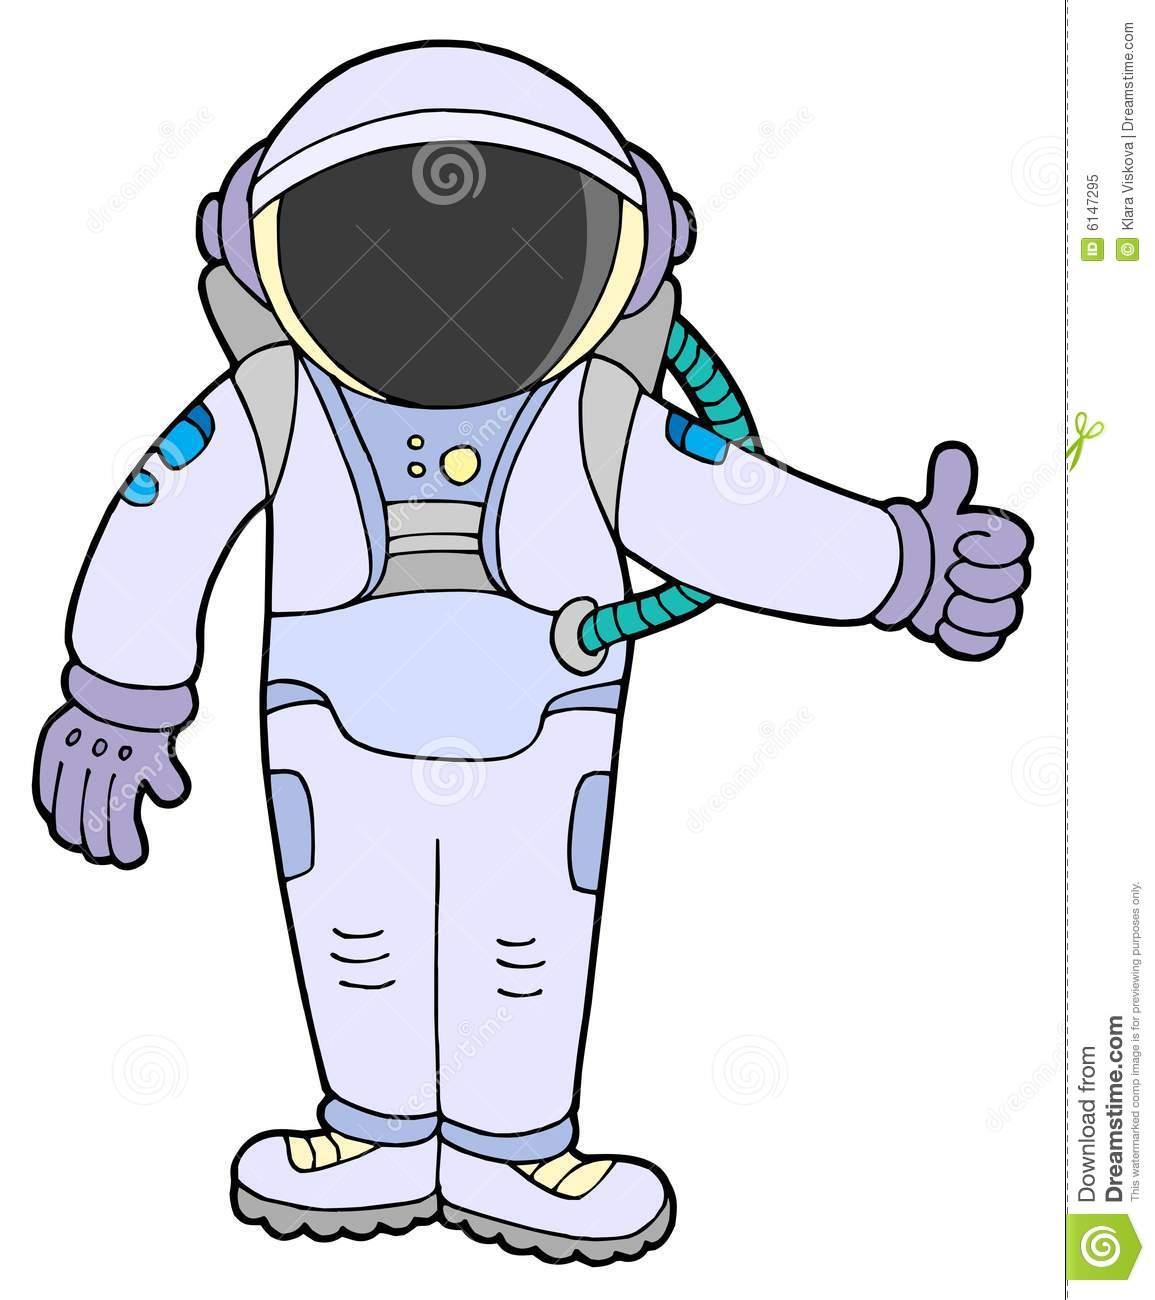 astronaut clipart clipart panda free clipart images rh clipartpanda com Astronaut Illustration Spaceship Clip Art Free